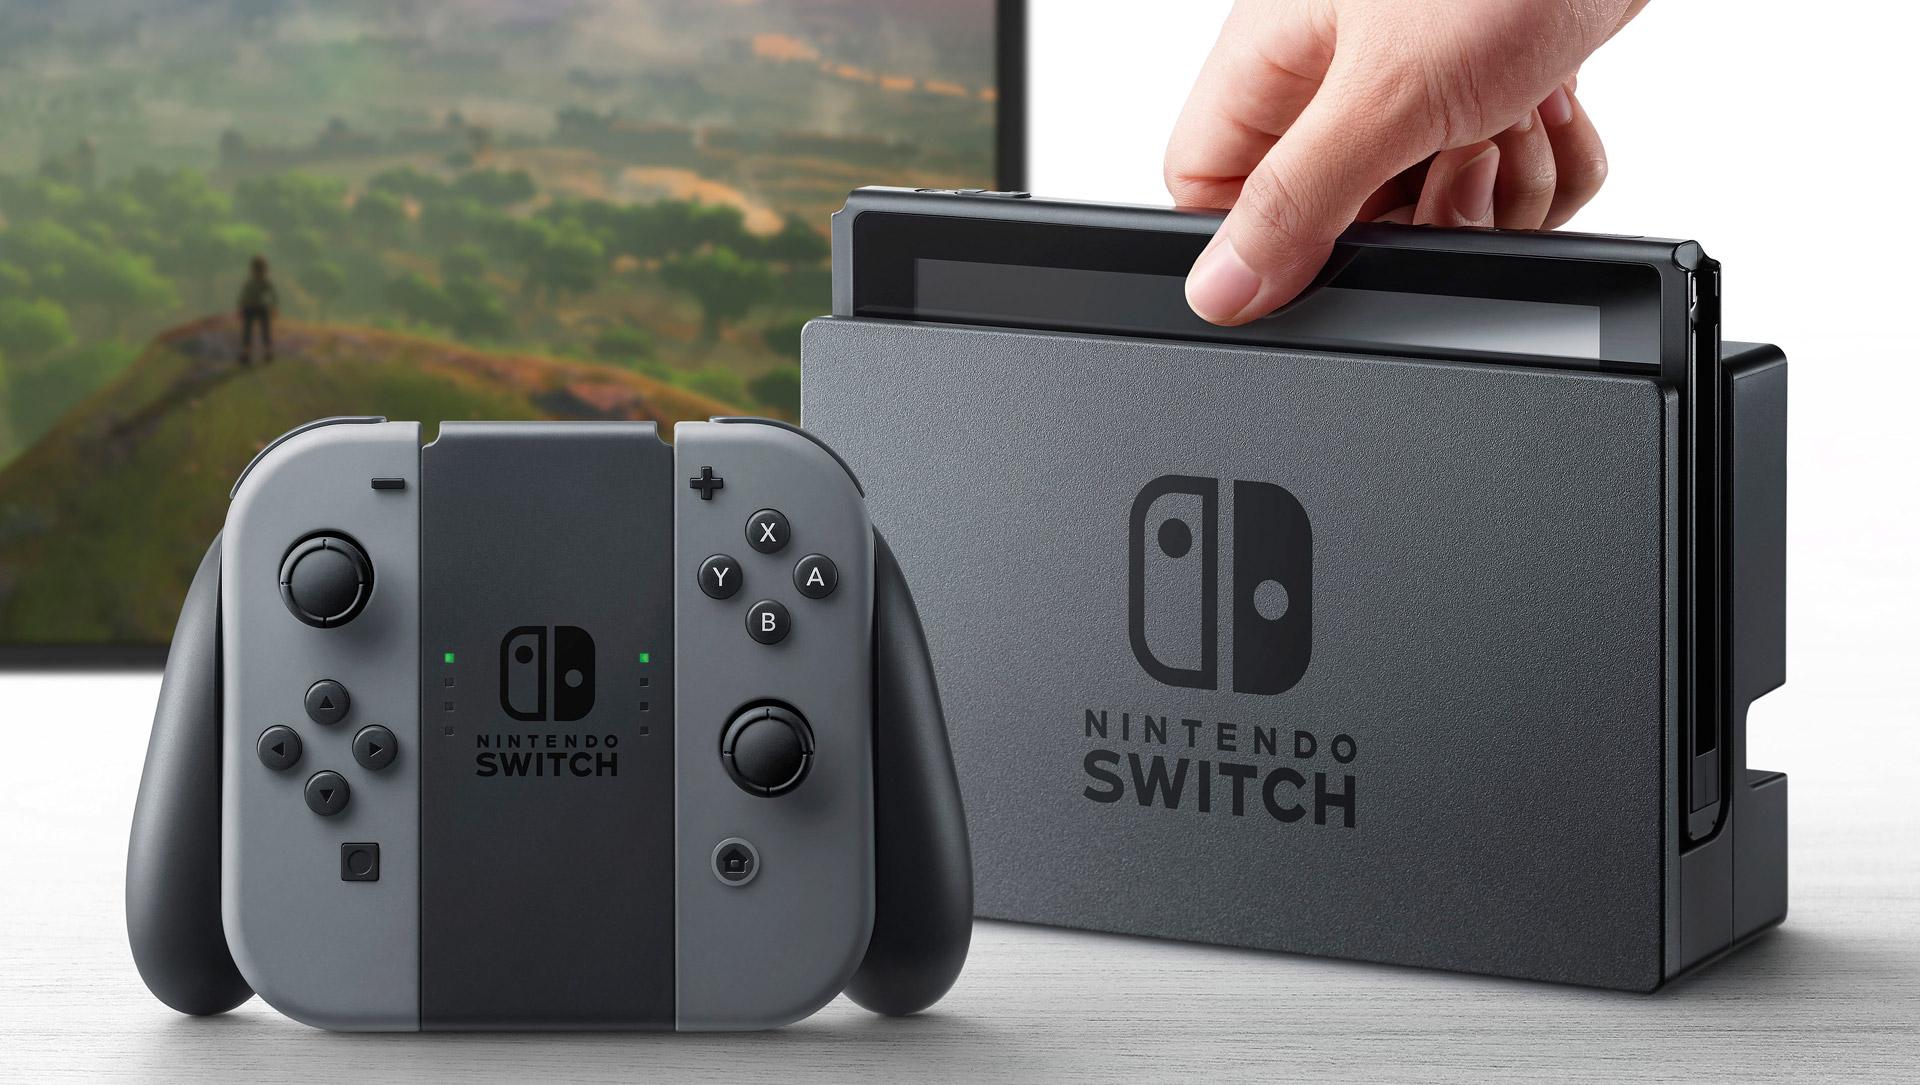 (Nintendo Switch - Nintendo)